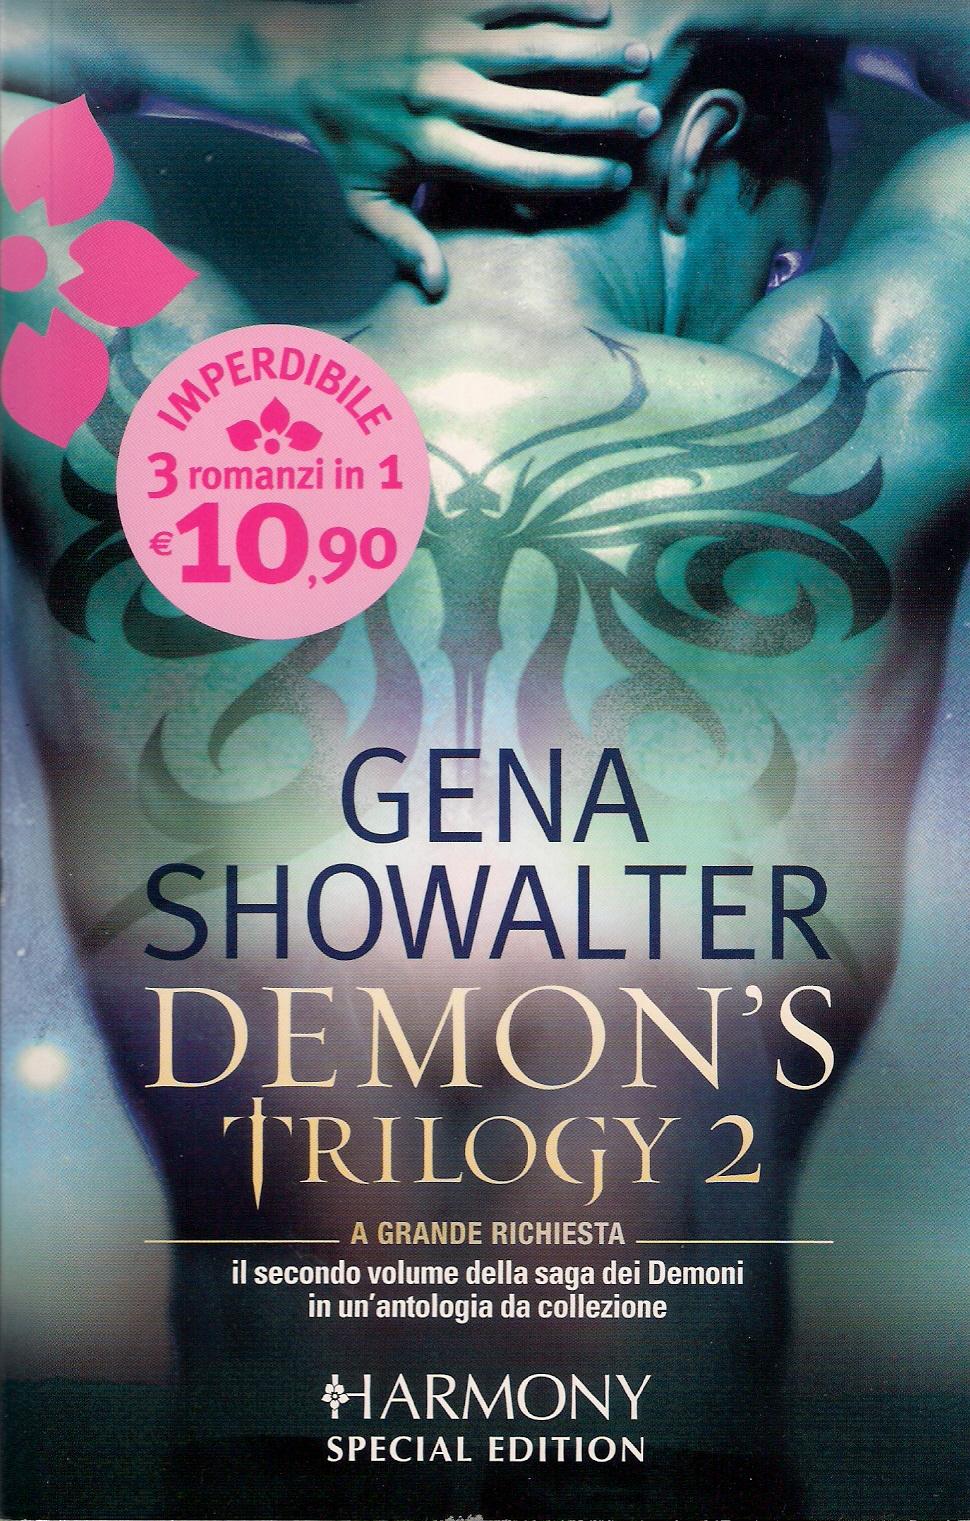 Demon's Trilogy 2